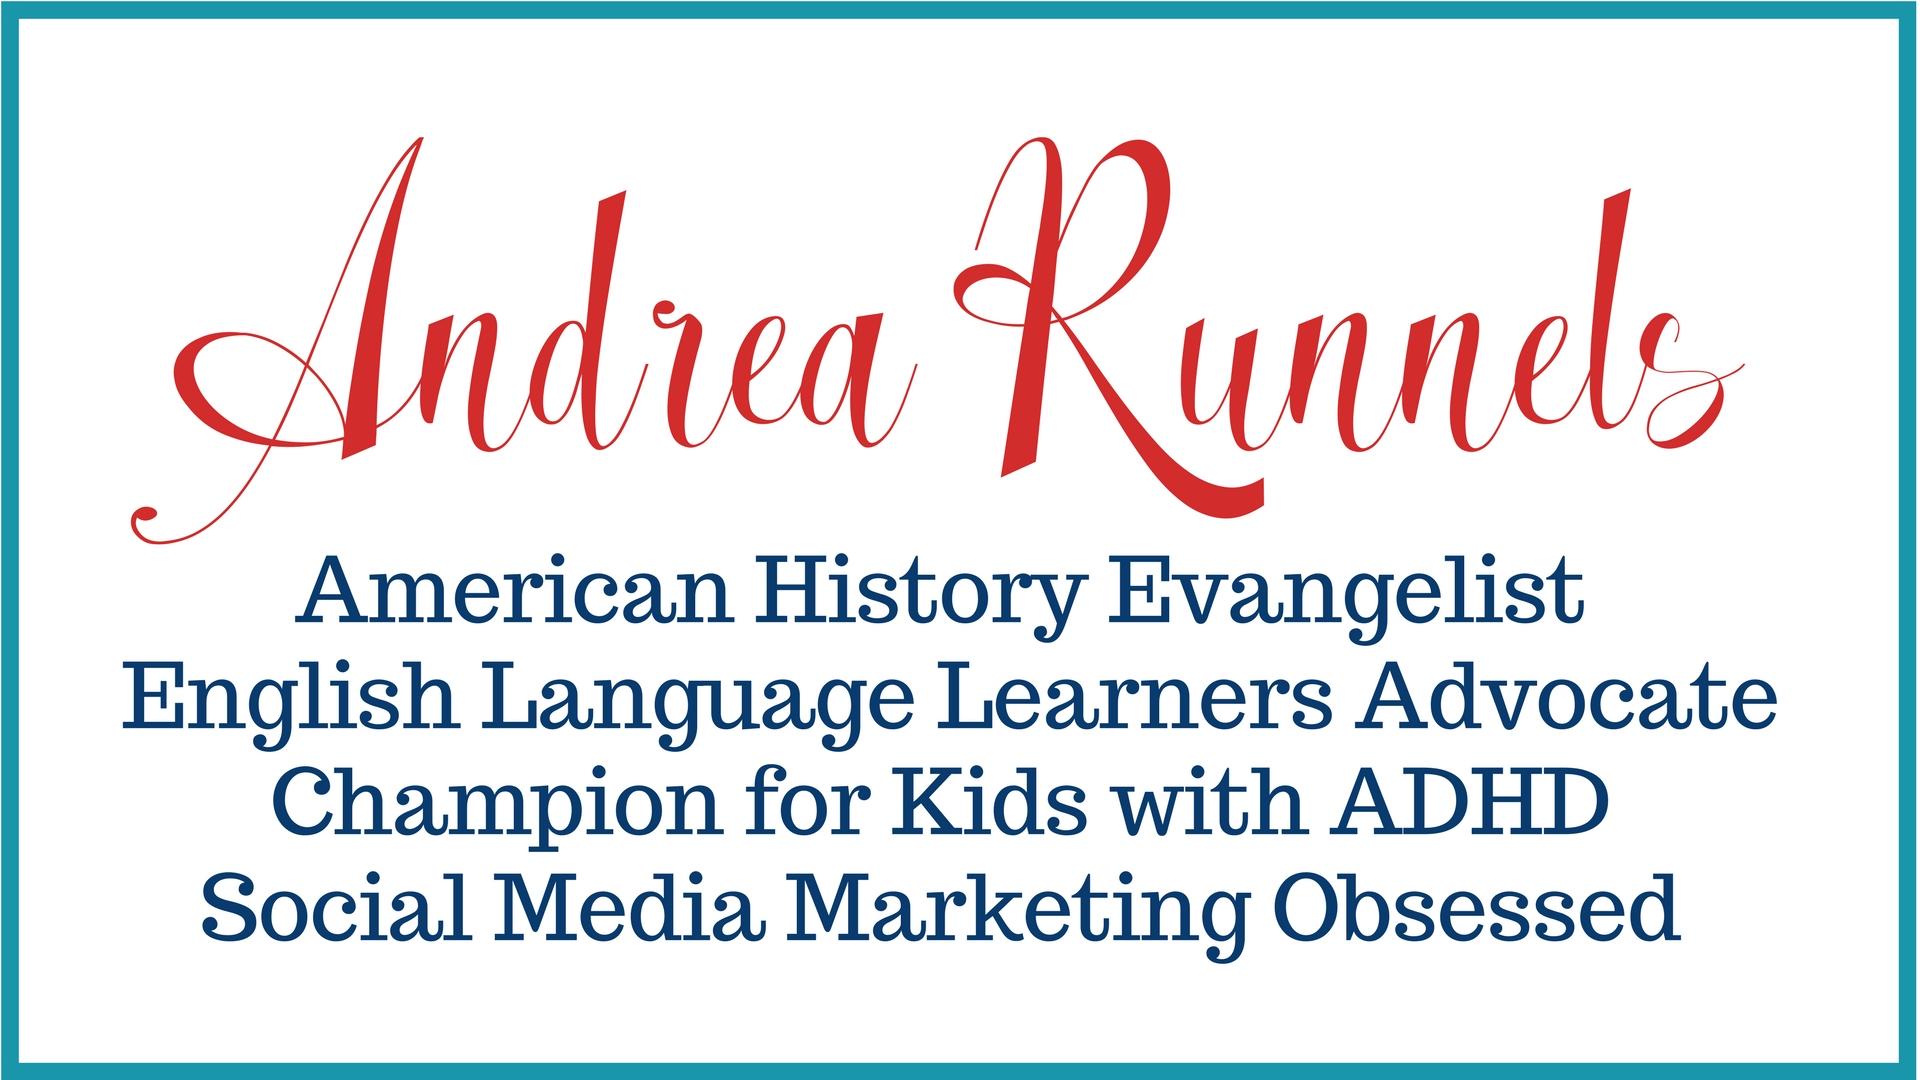 Andrea Runnels